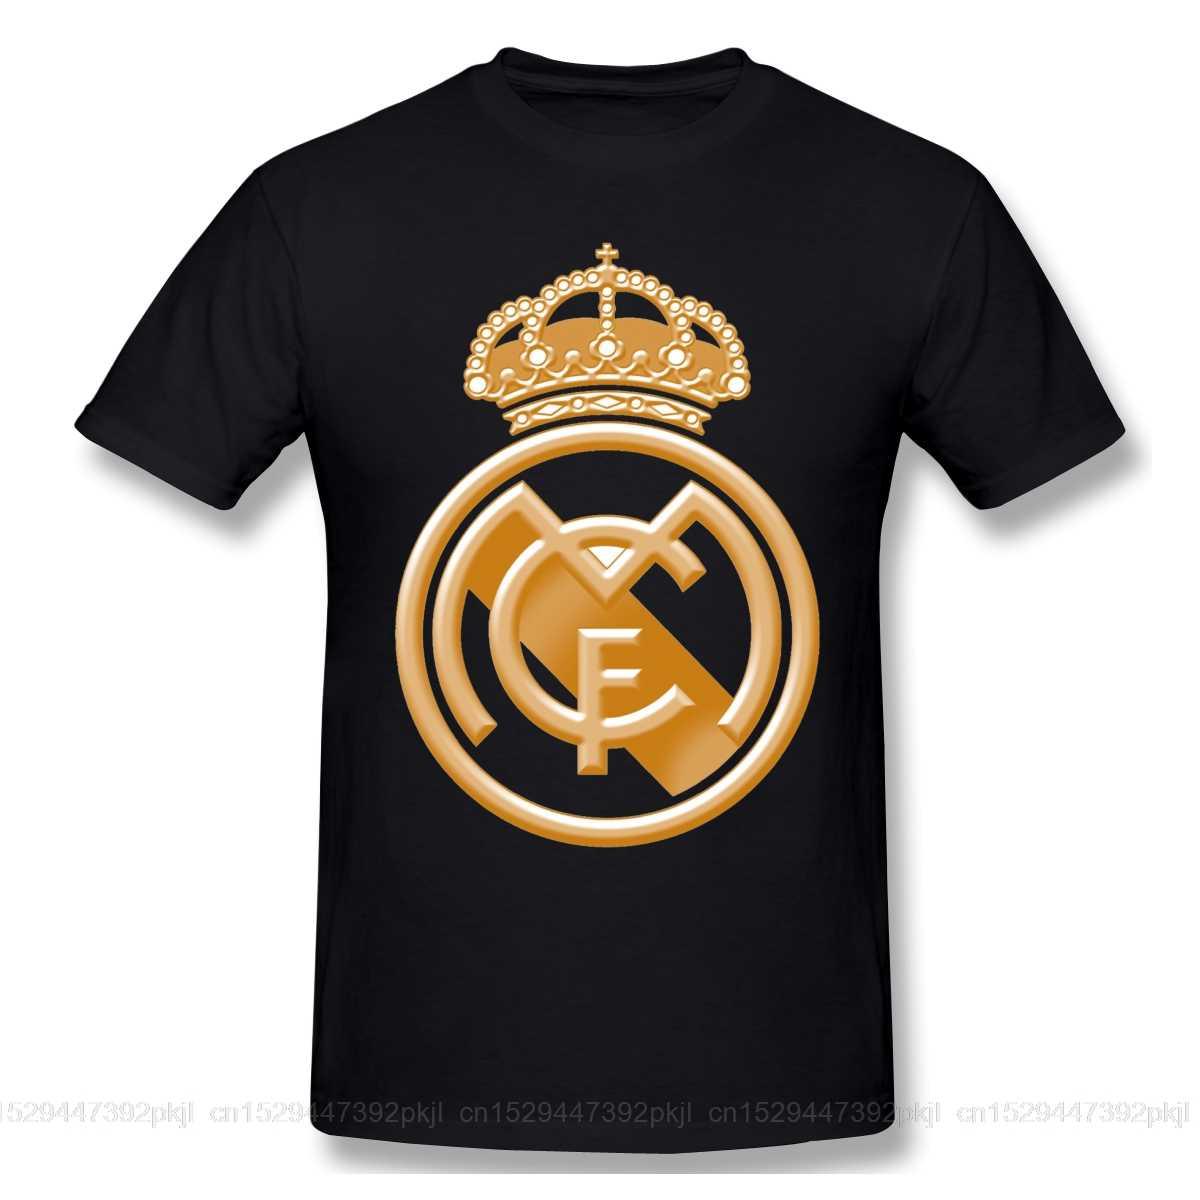 T Shirts Männer Goldene Reales Madrided Crest T-shirt Hohe Qualität T Vater Tag Tops 100% Baumwolle fußball team Reine Baumwolle tees